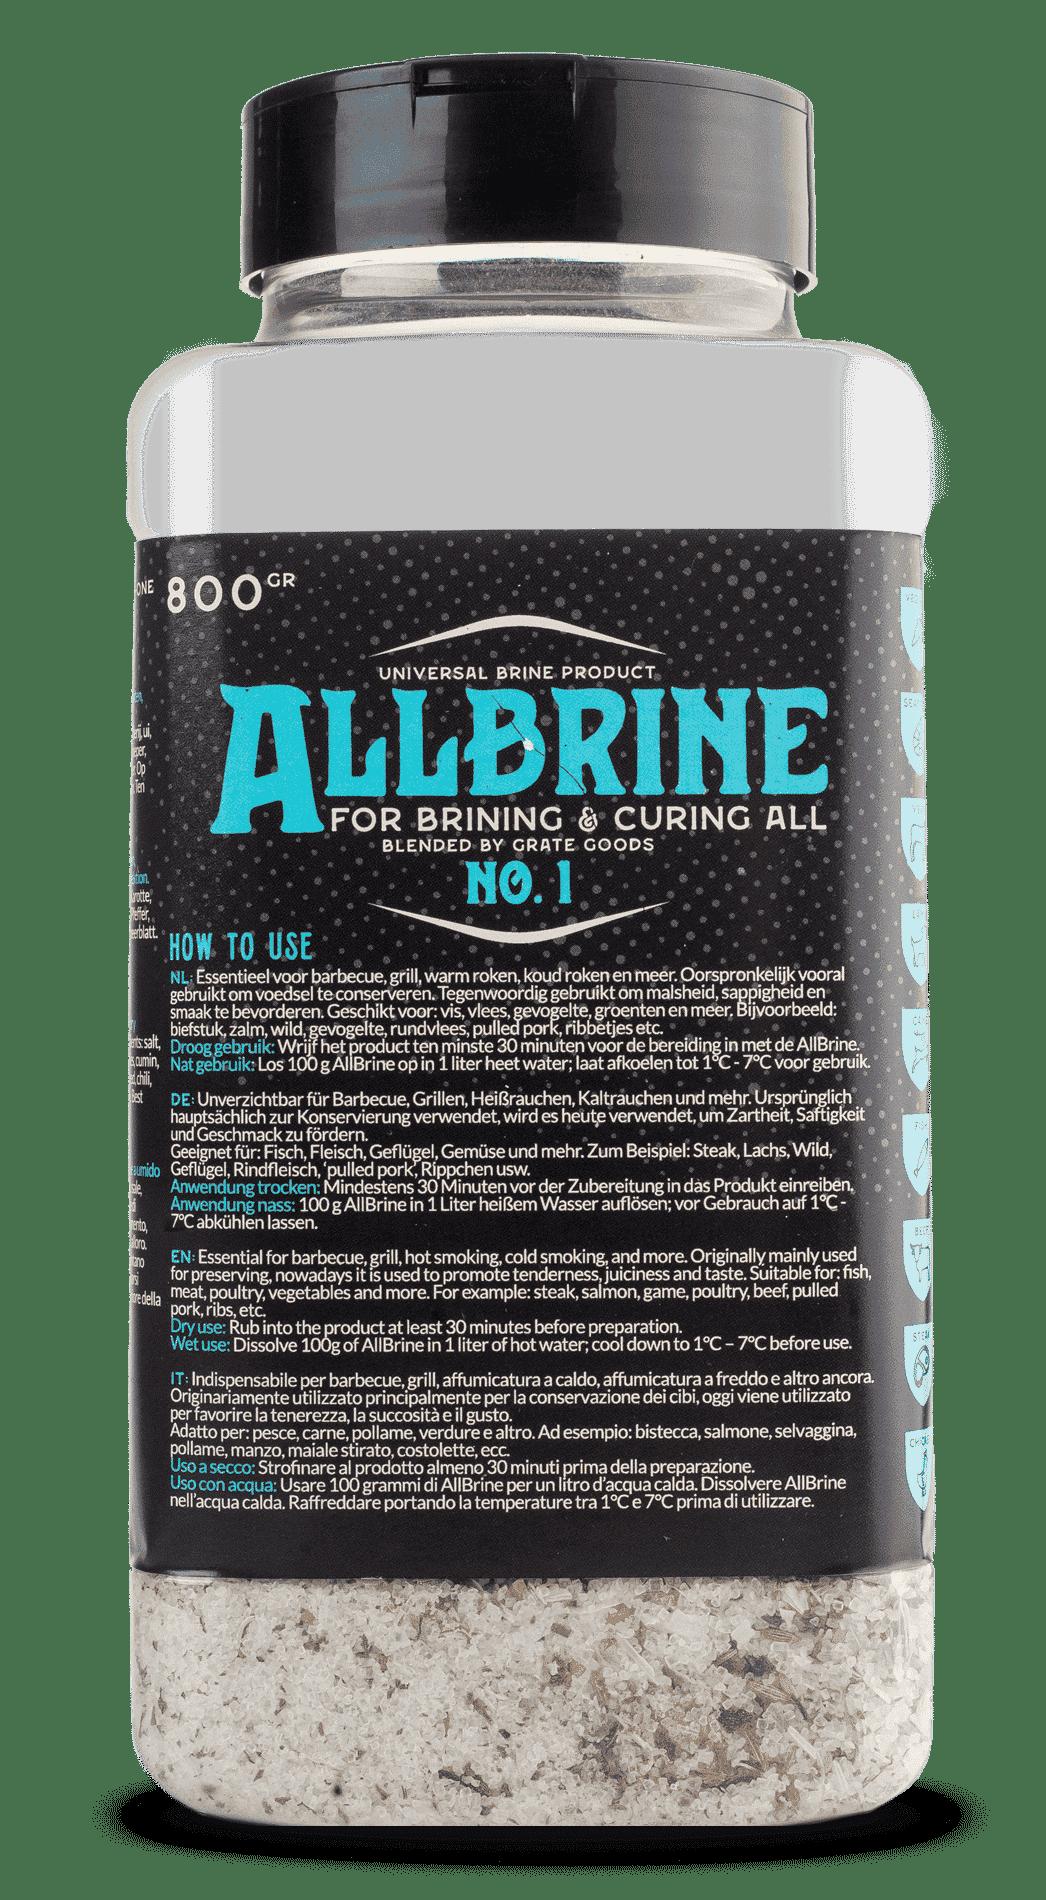 Grate Goods Allbrine no.1